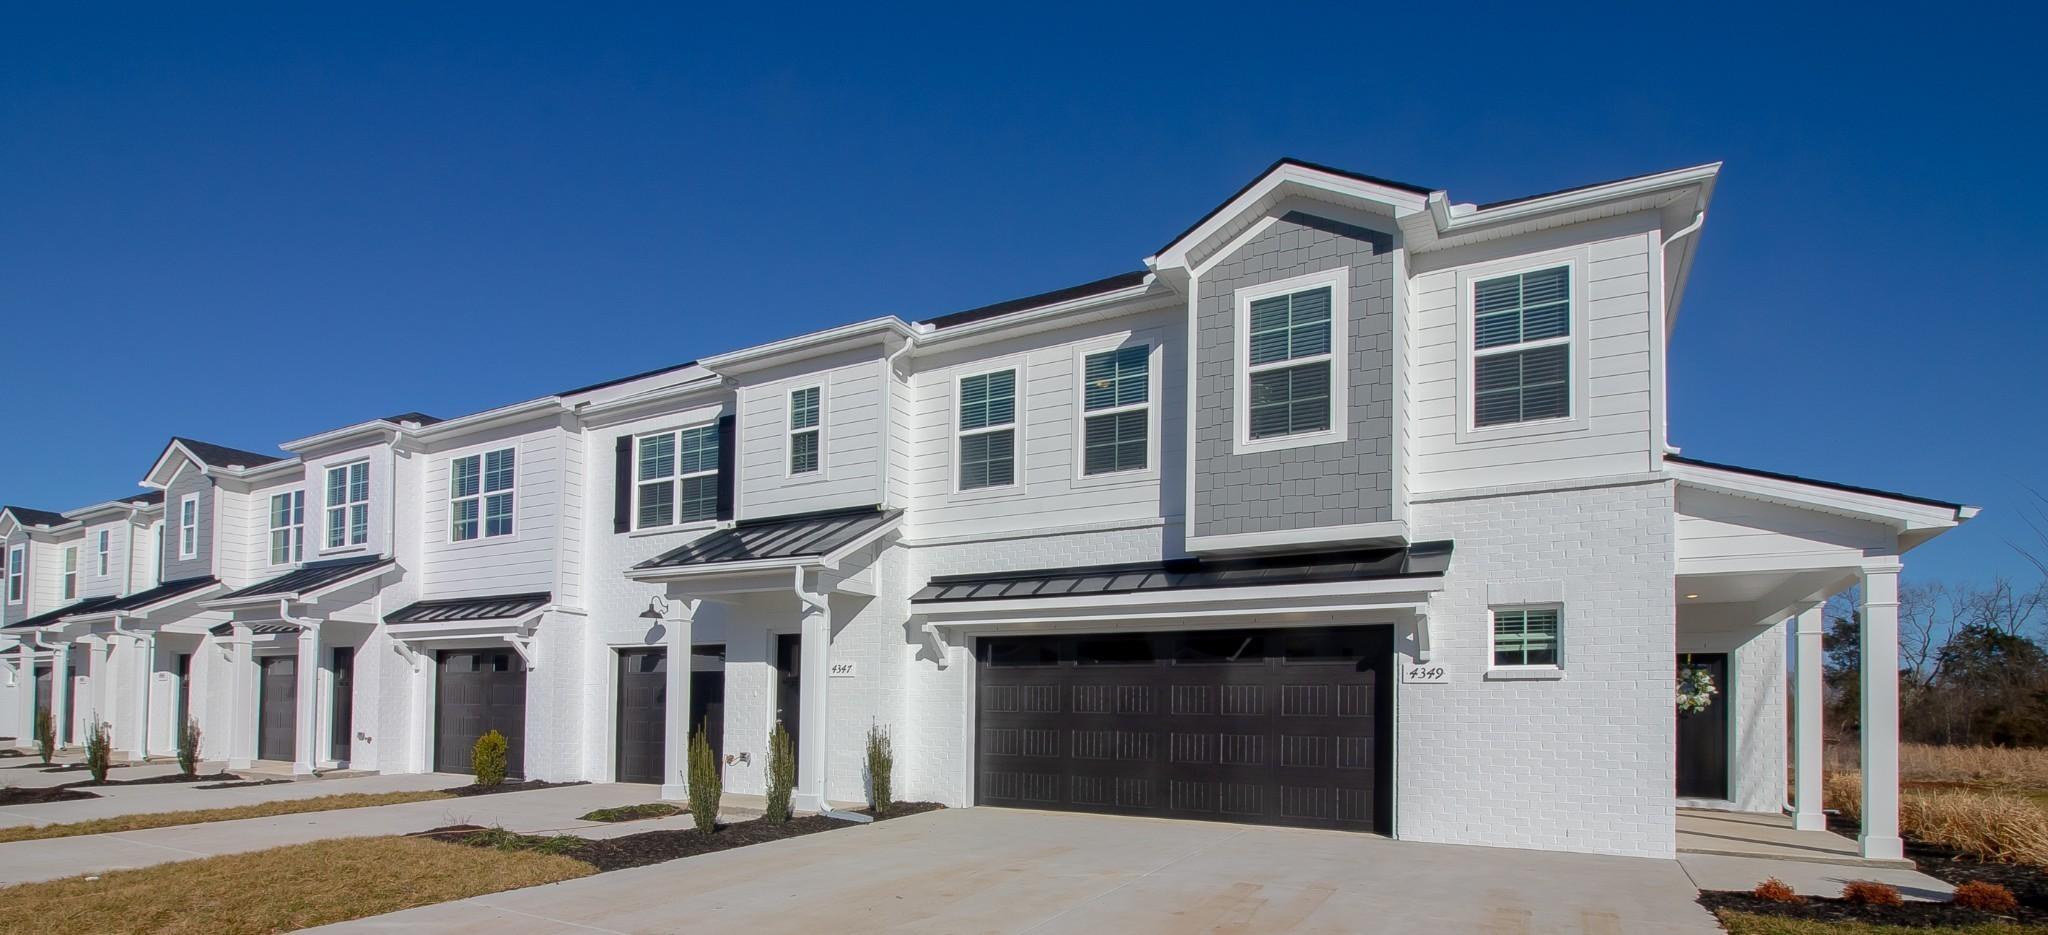 4211 Sarazen Ln Property Photo - Murfreesboro, TN real estate listing